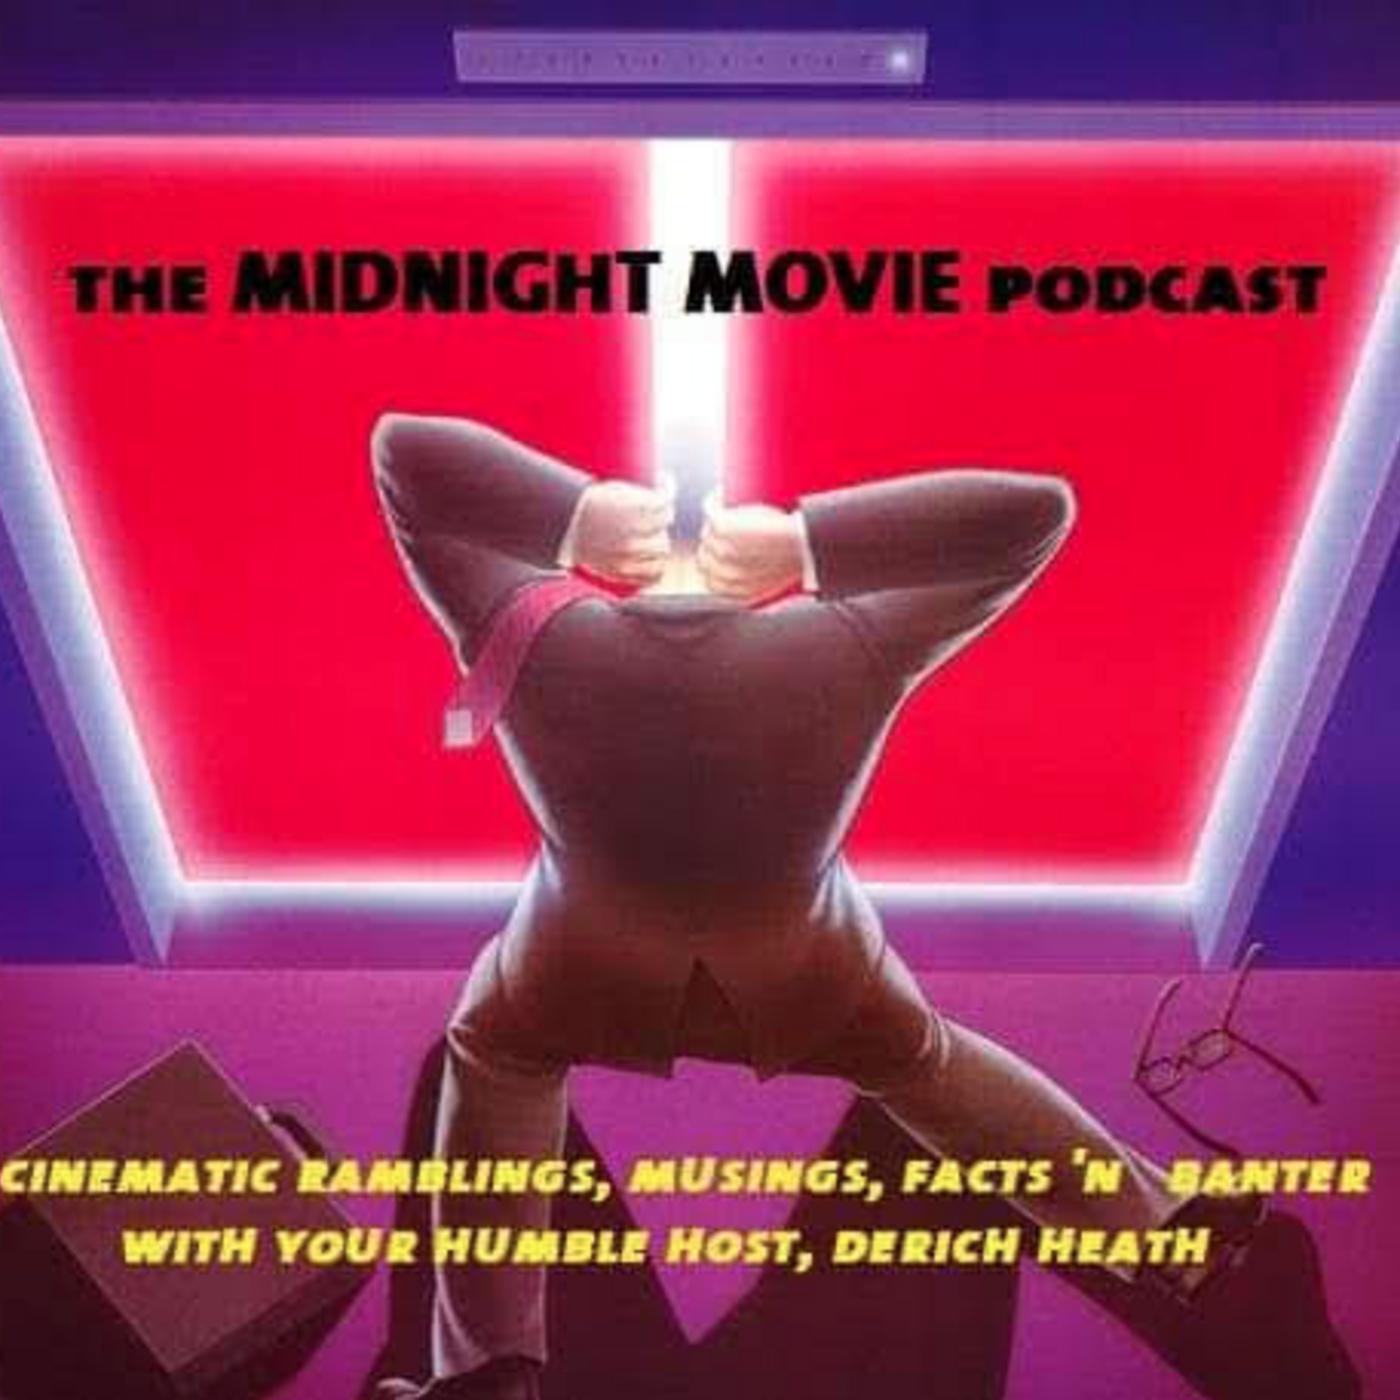 The Midnight Movie Podcast